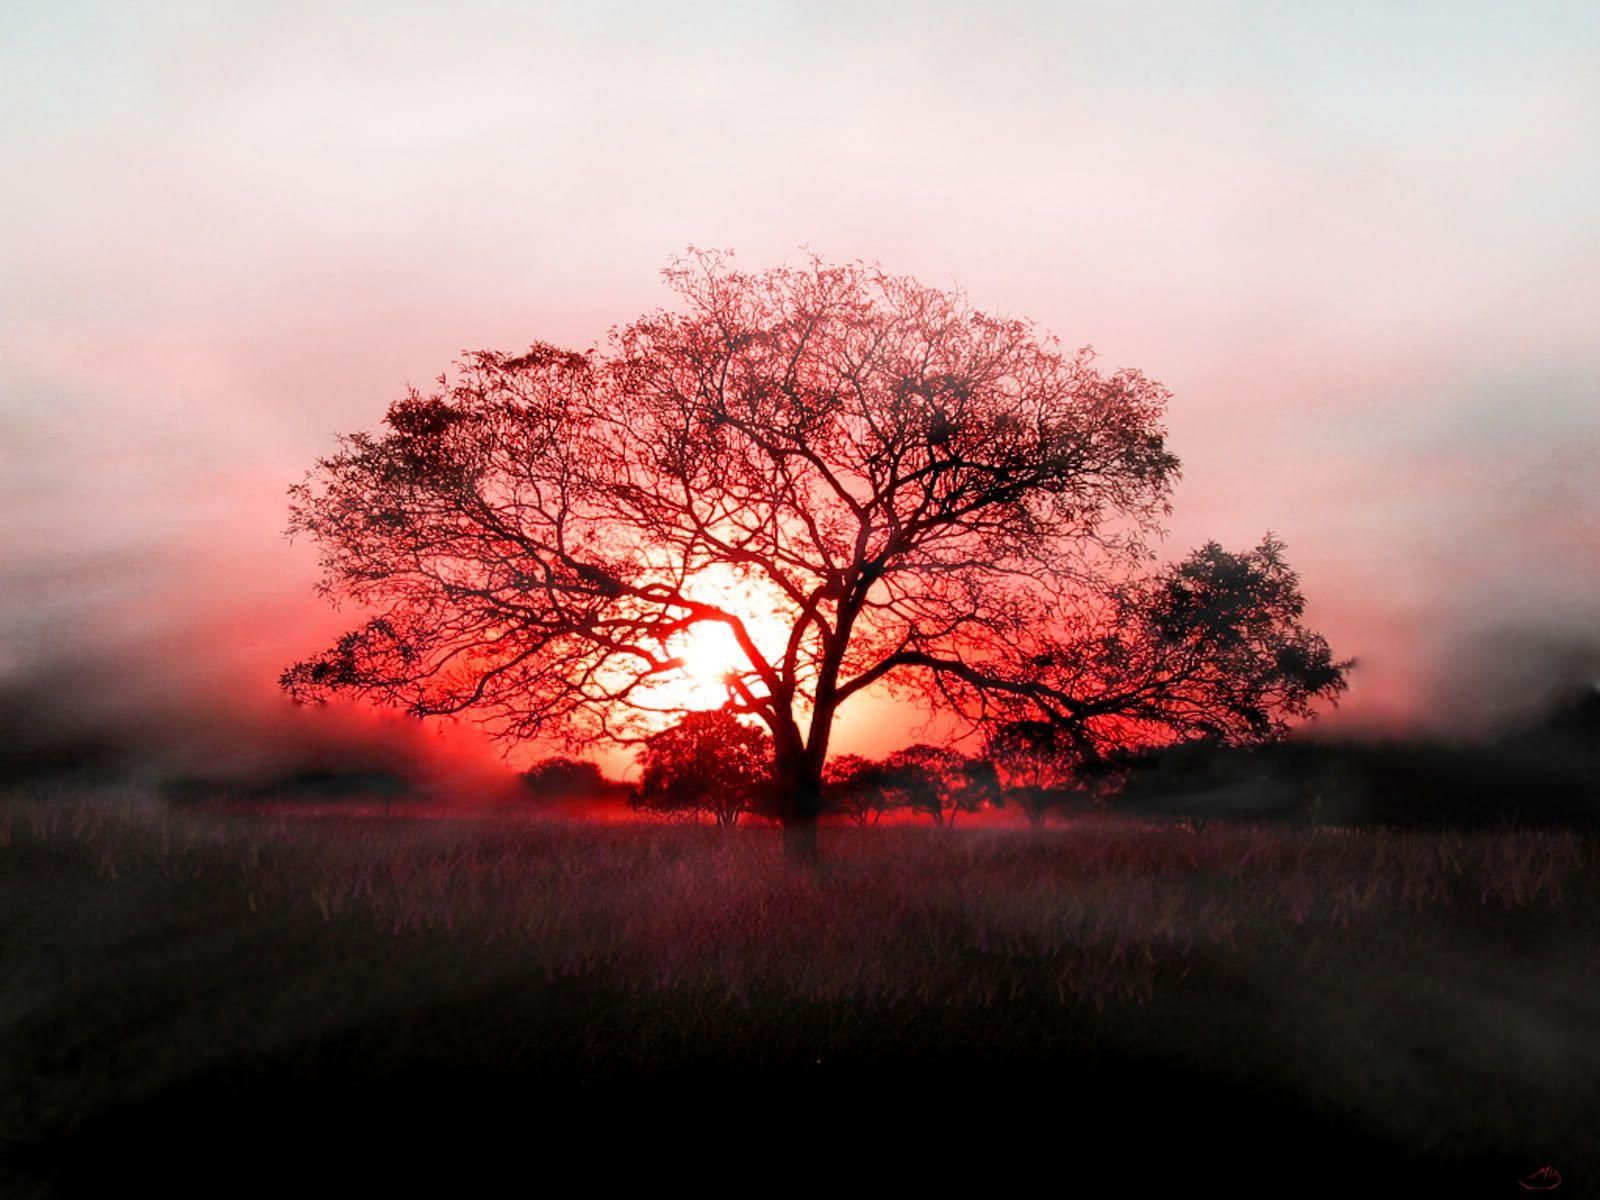 http://4.bp.blogspot.com/_ndhAuebWldg/TA3DnsPWrUI/AAAAAAAAAlQ/I8S39Kukbq4/s1600/Sunset.jpg